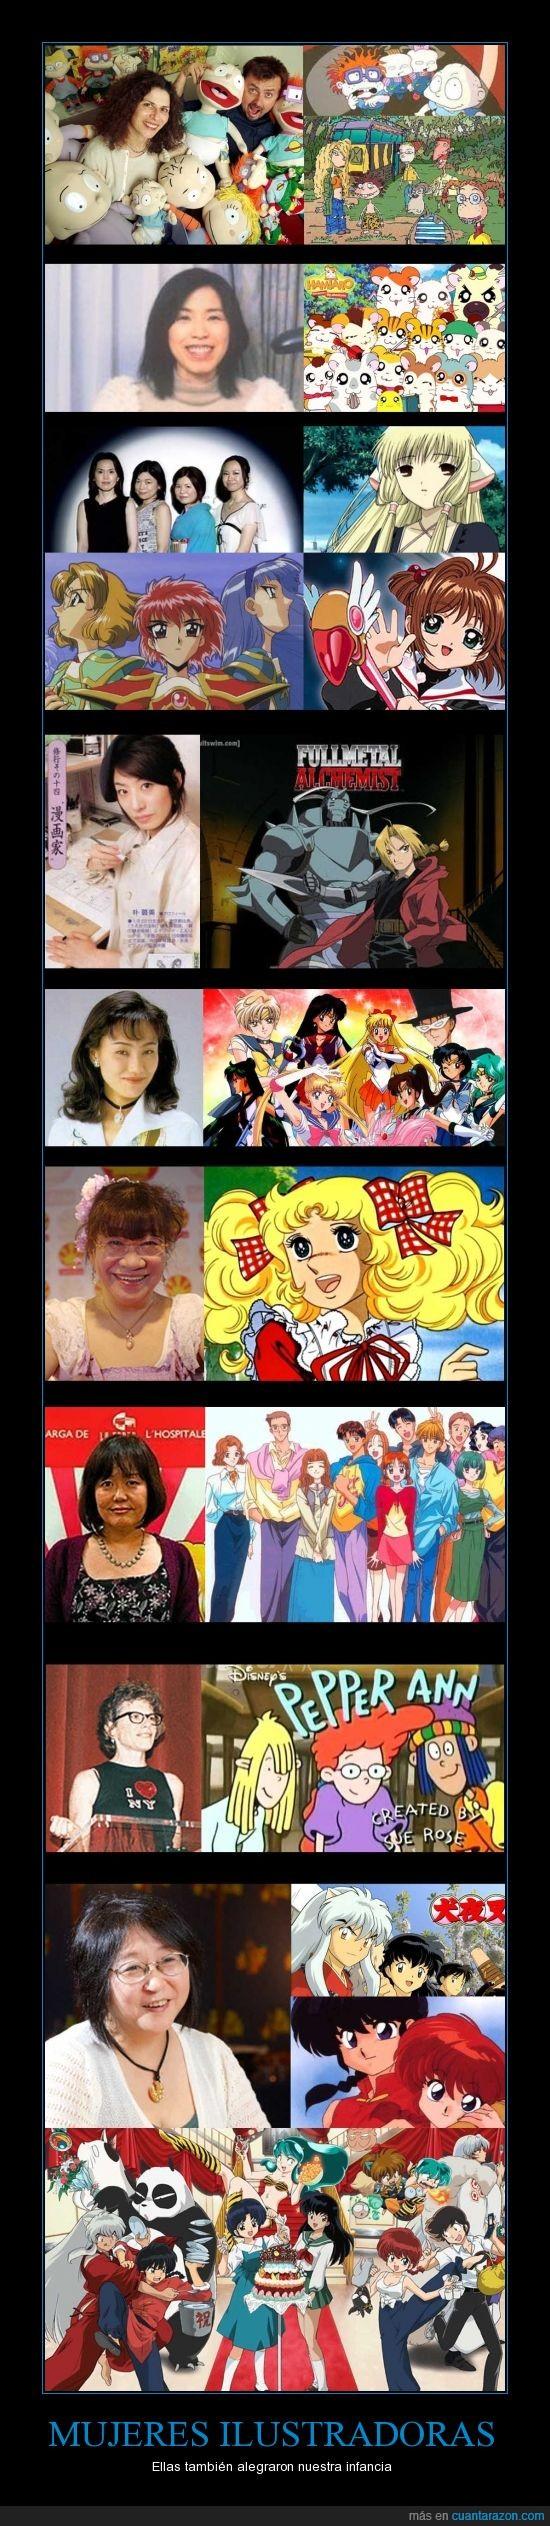 candy candy,chobits,fullmetal alchemist,hamtaro,ilustradoras,inuyasha,las guerreras mágicas,marmalade boy,mujeres,pepper ann,ranma,rugrats,sailor moon,sakura,thornberrys